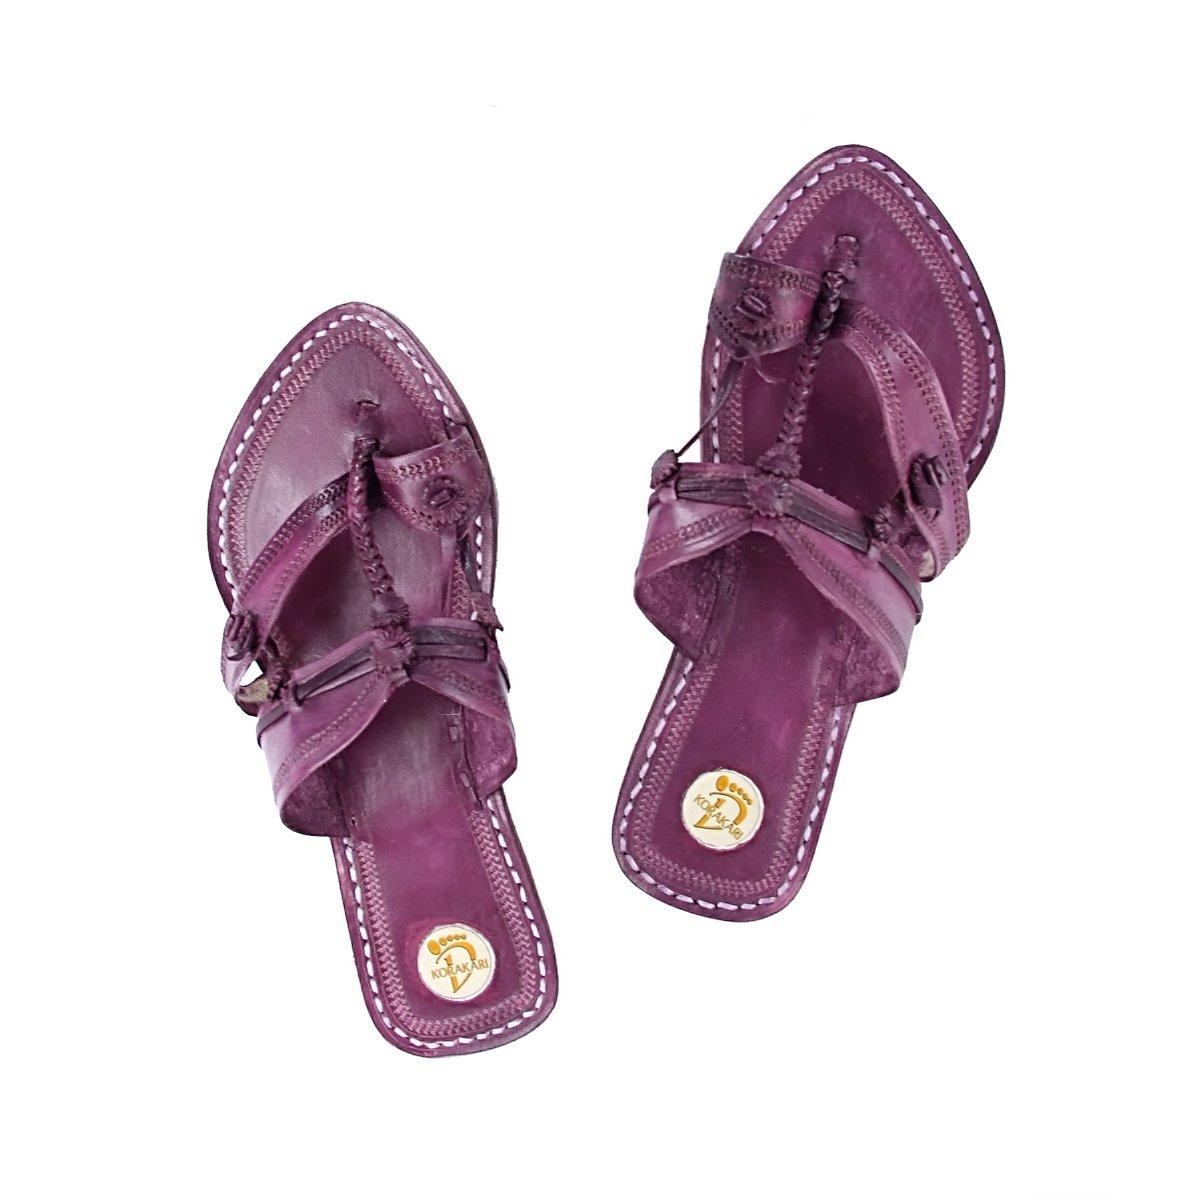 KOLHAPURI CHAPPAL Original Antiqua Design viola Pointed Kolhapuri Ladies Ladies Ladies Chappal Slipper Sandal 86b9e1